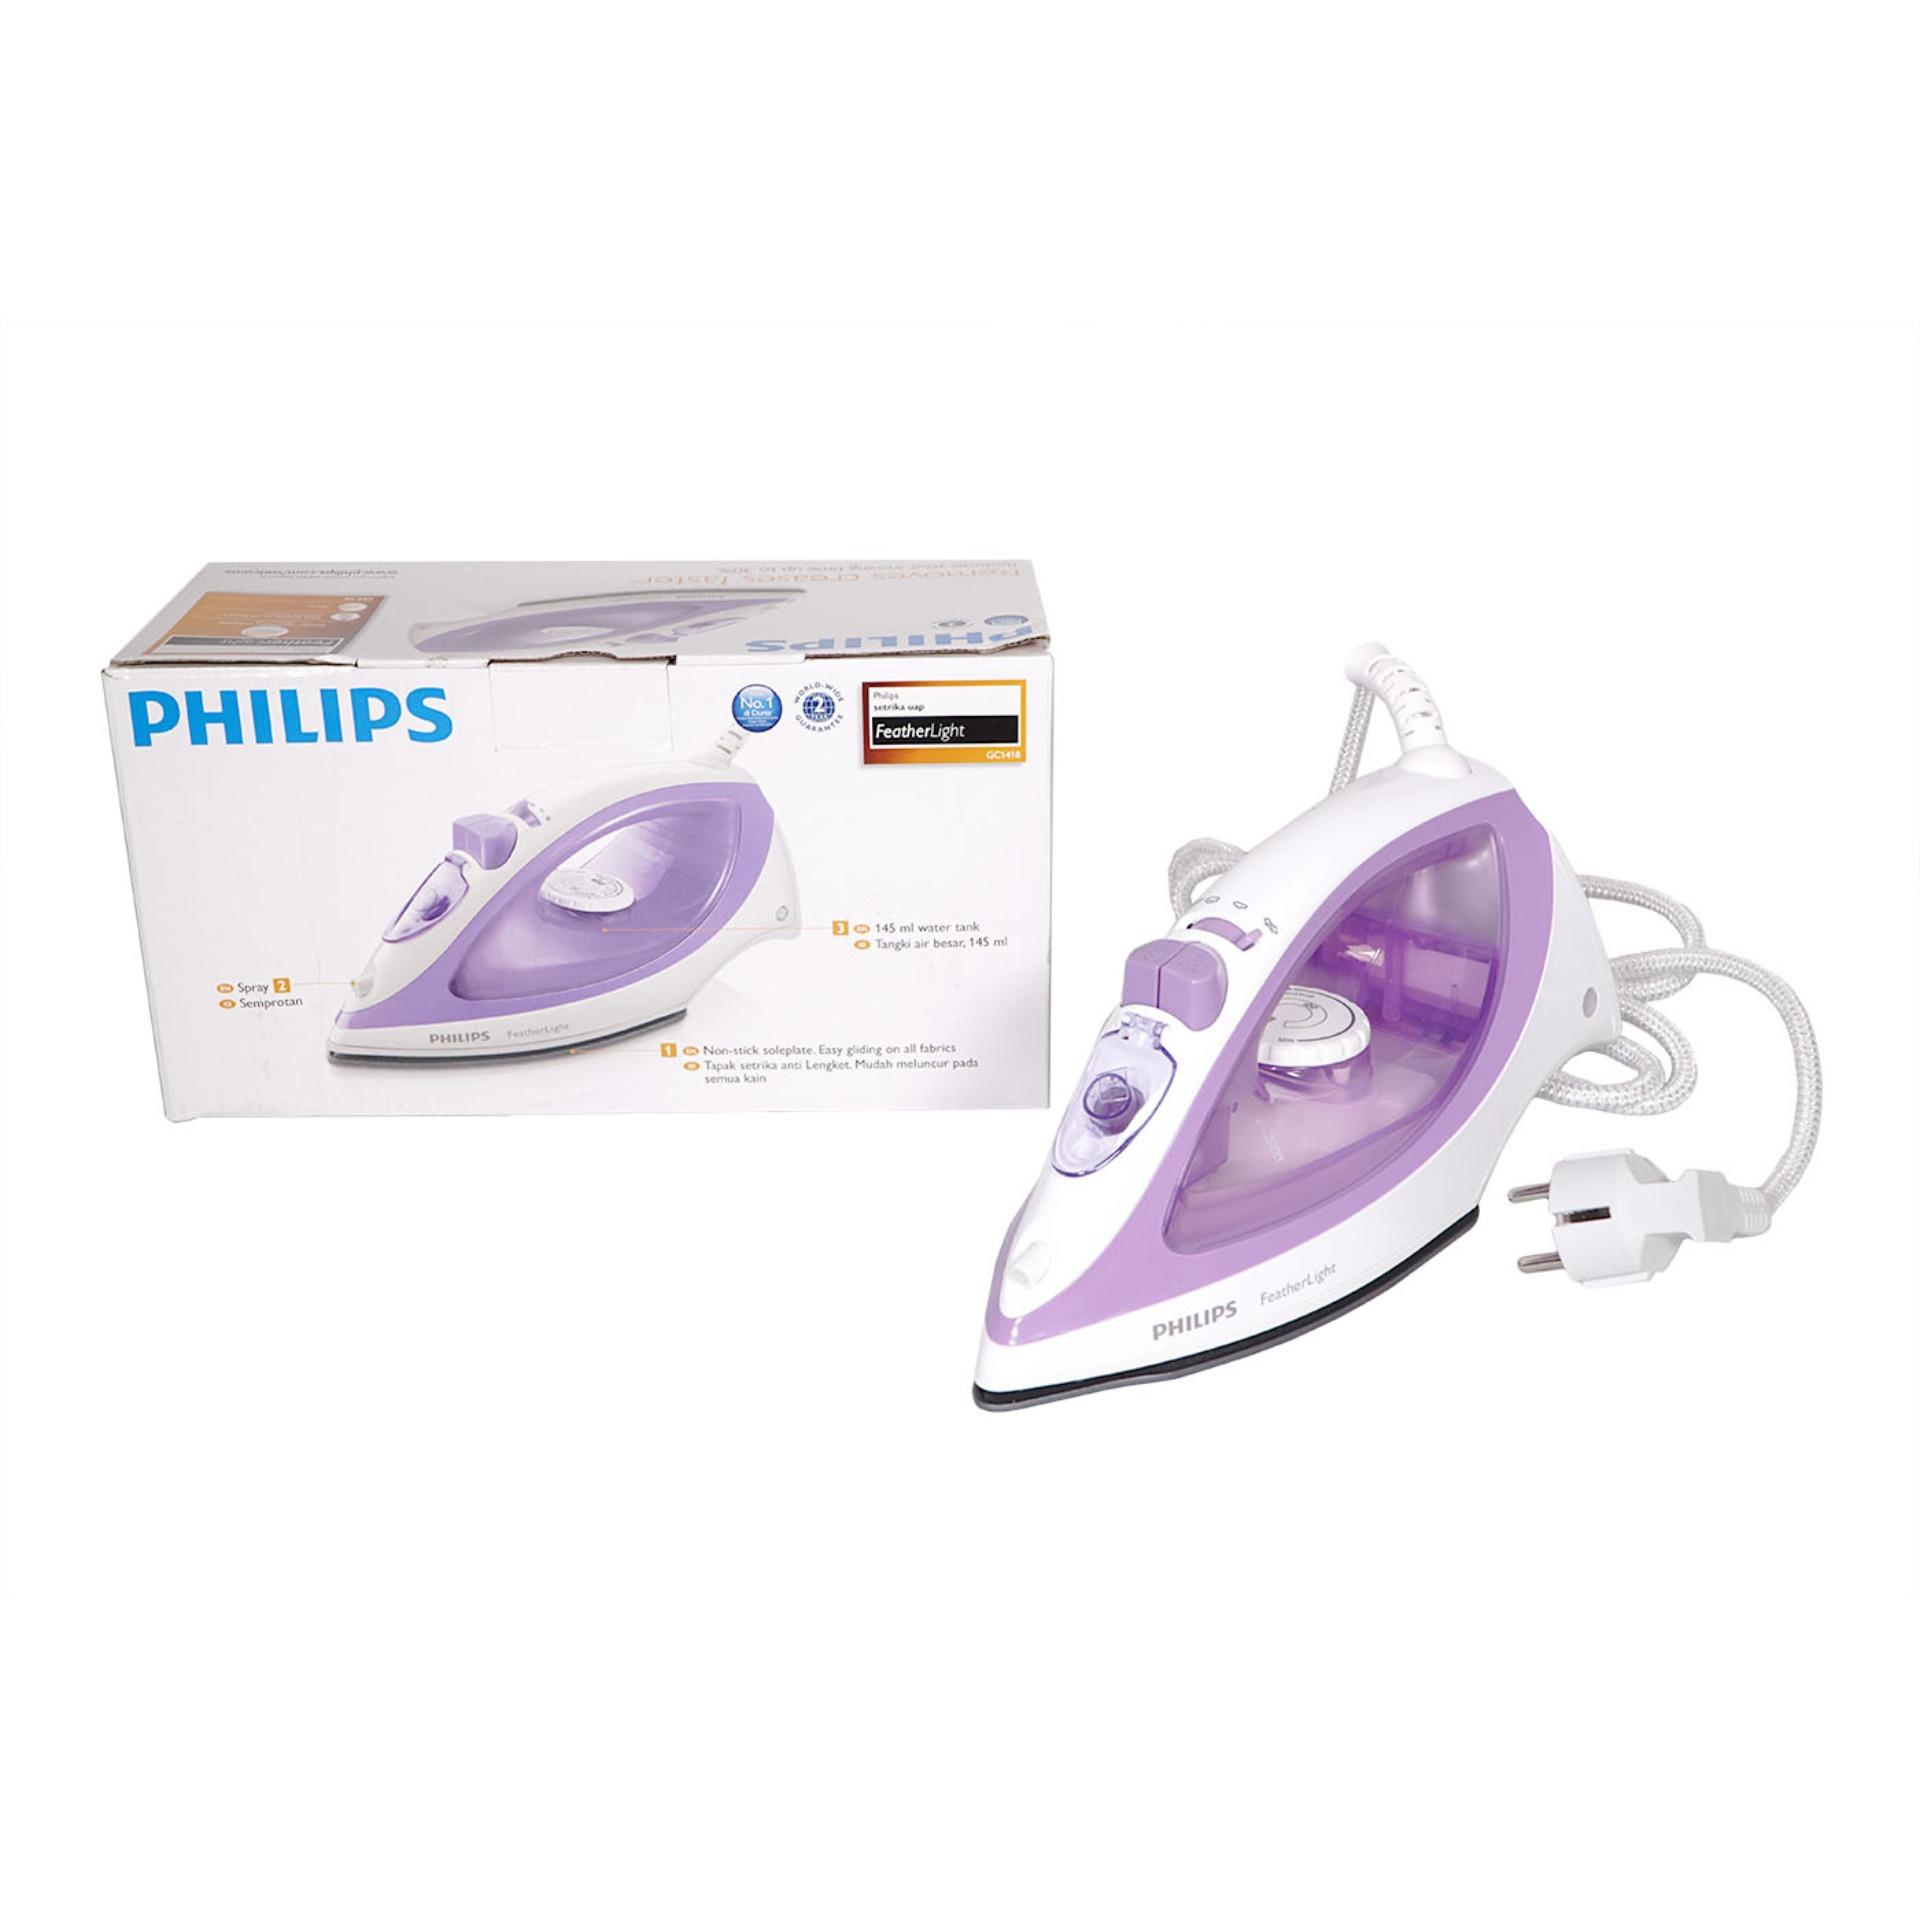 Philips Setrika Uap Gc1418 Ungu Original Daftar Harga Terkini dan Source · Philips Setrika Uap FeatherLIght